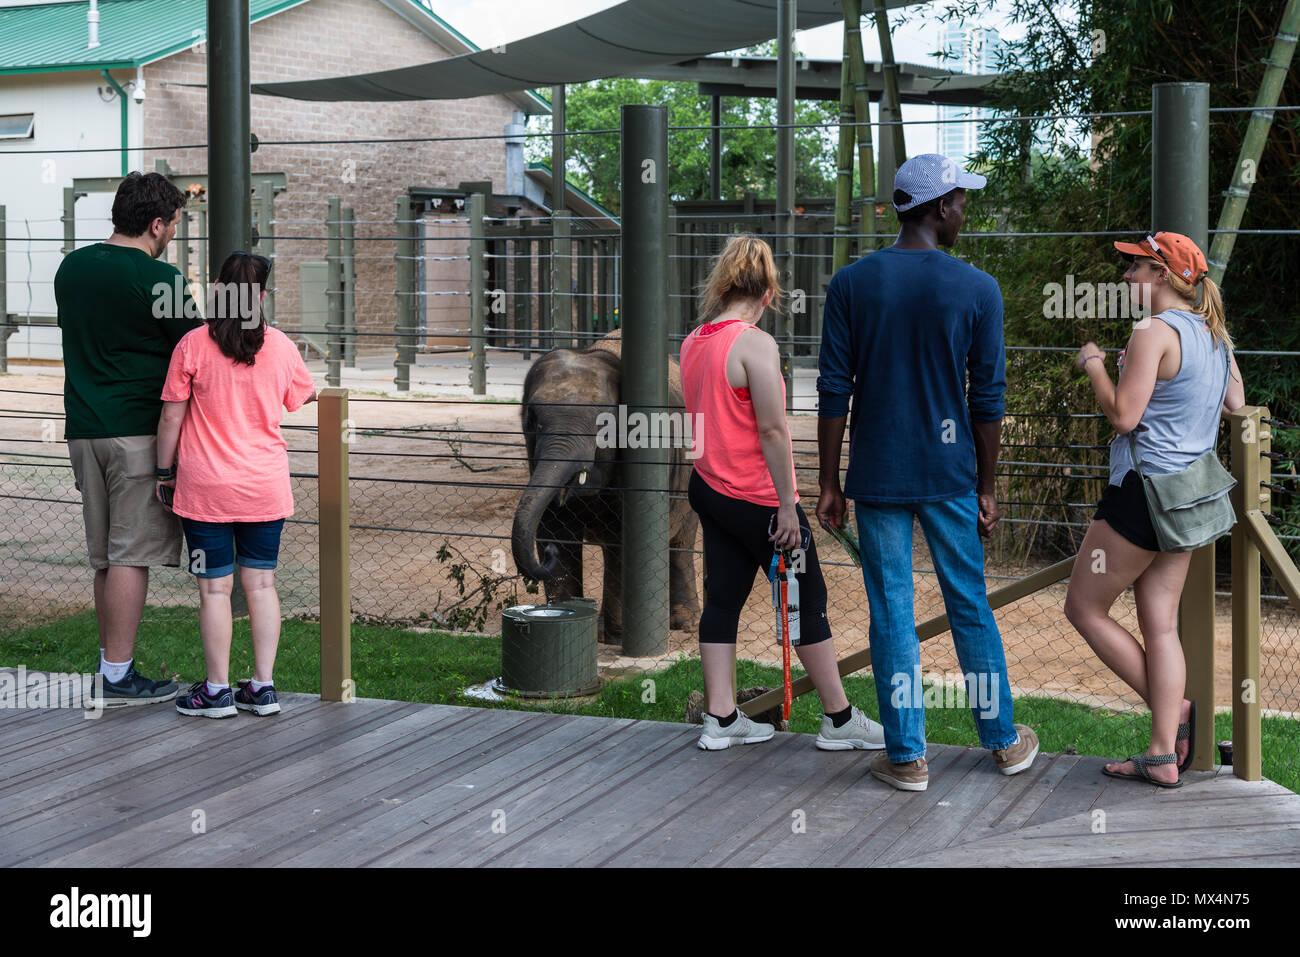 Families and friends enjoy a baby elephants at the Houston Zoo. Houston, Texas, USA. - Stock Image